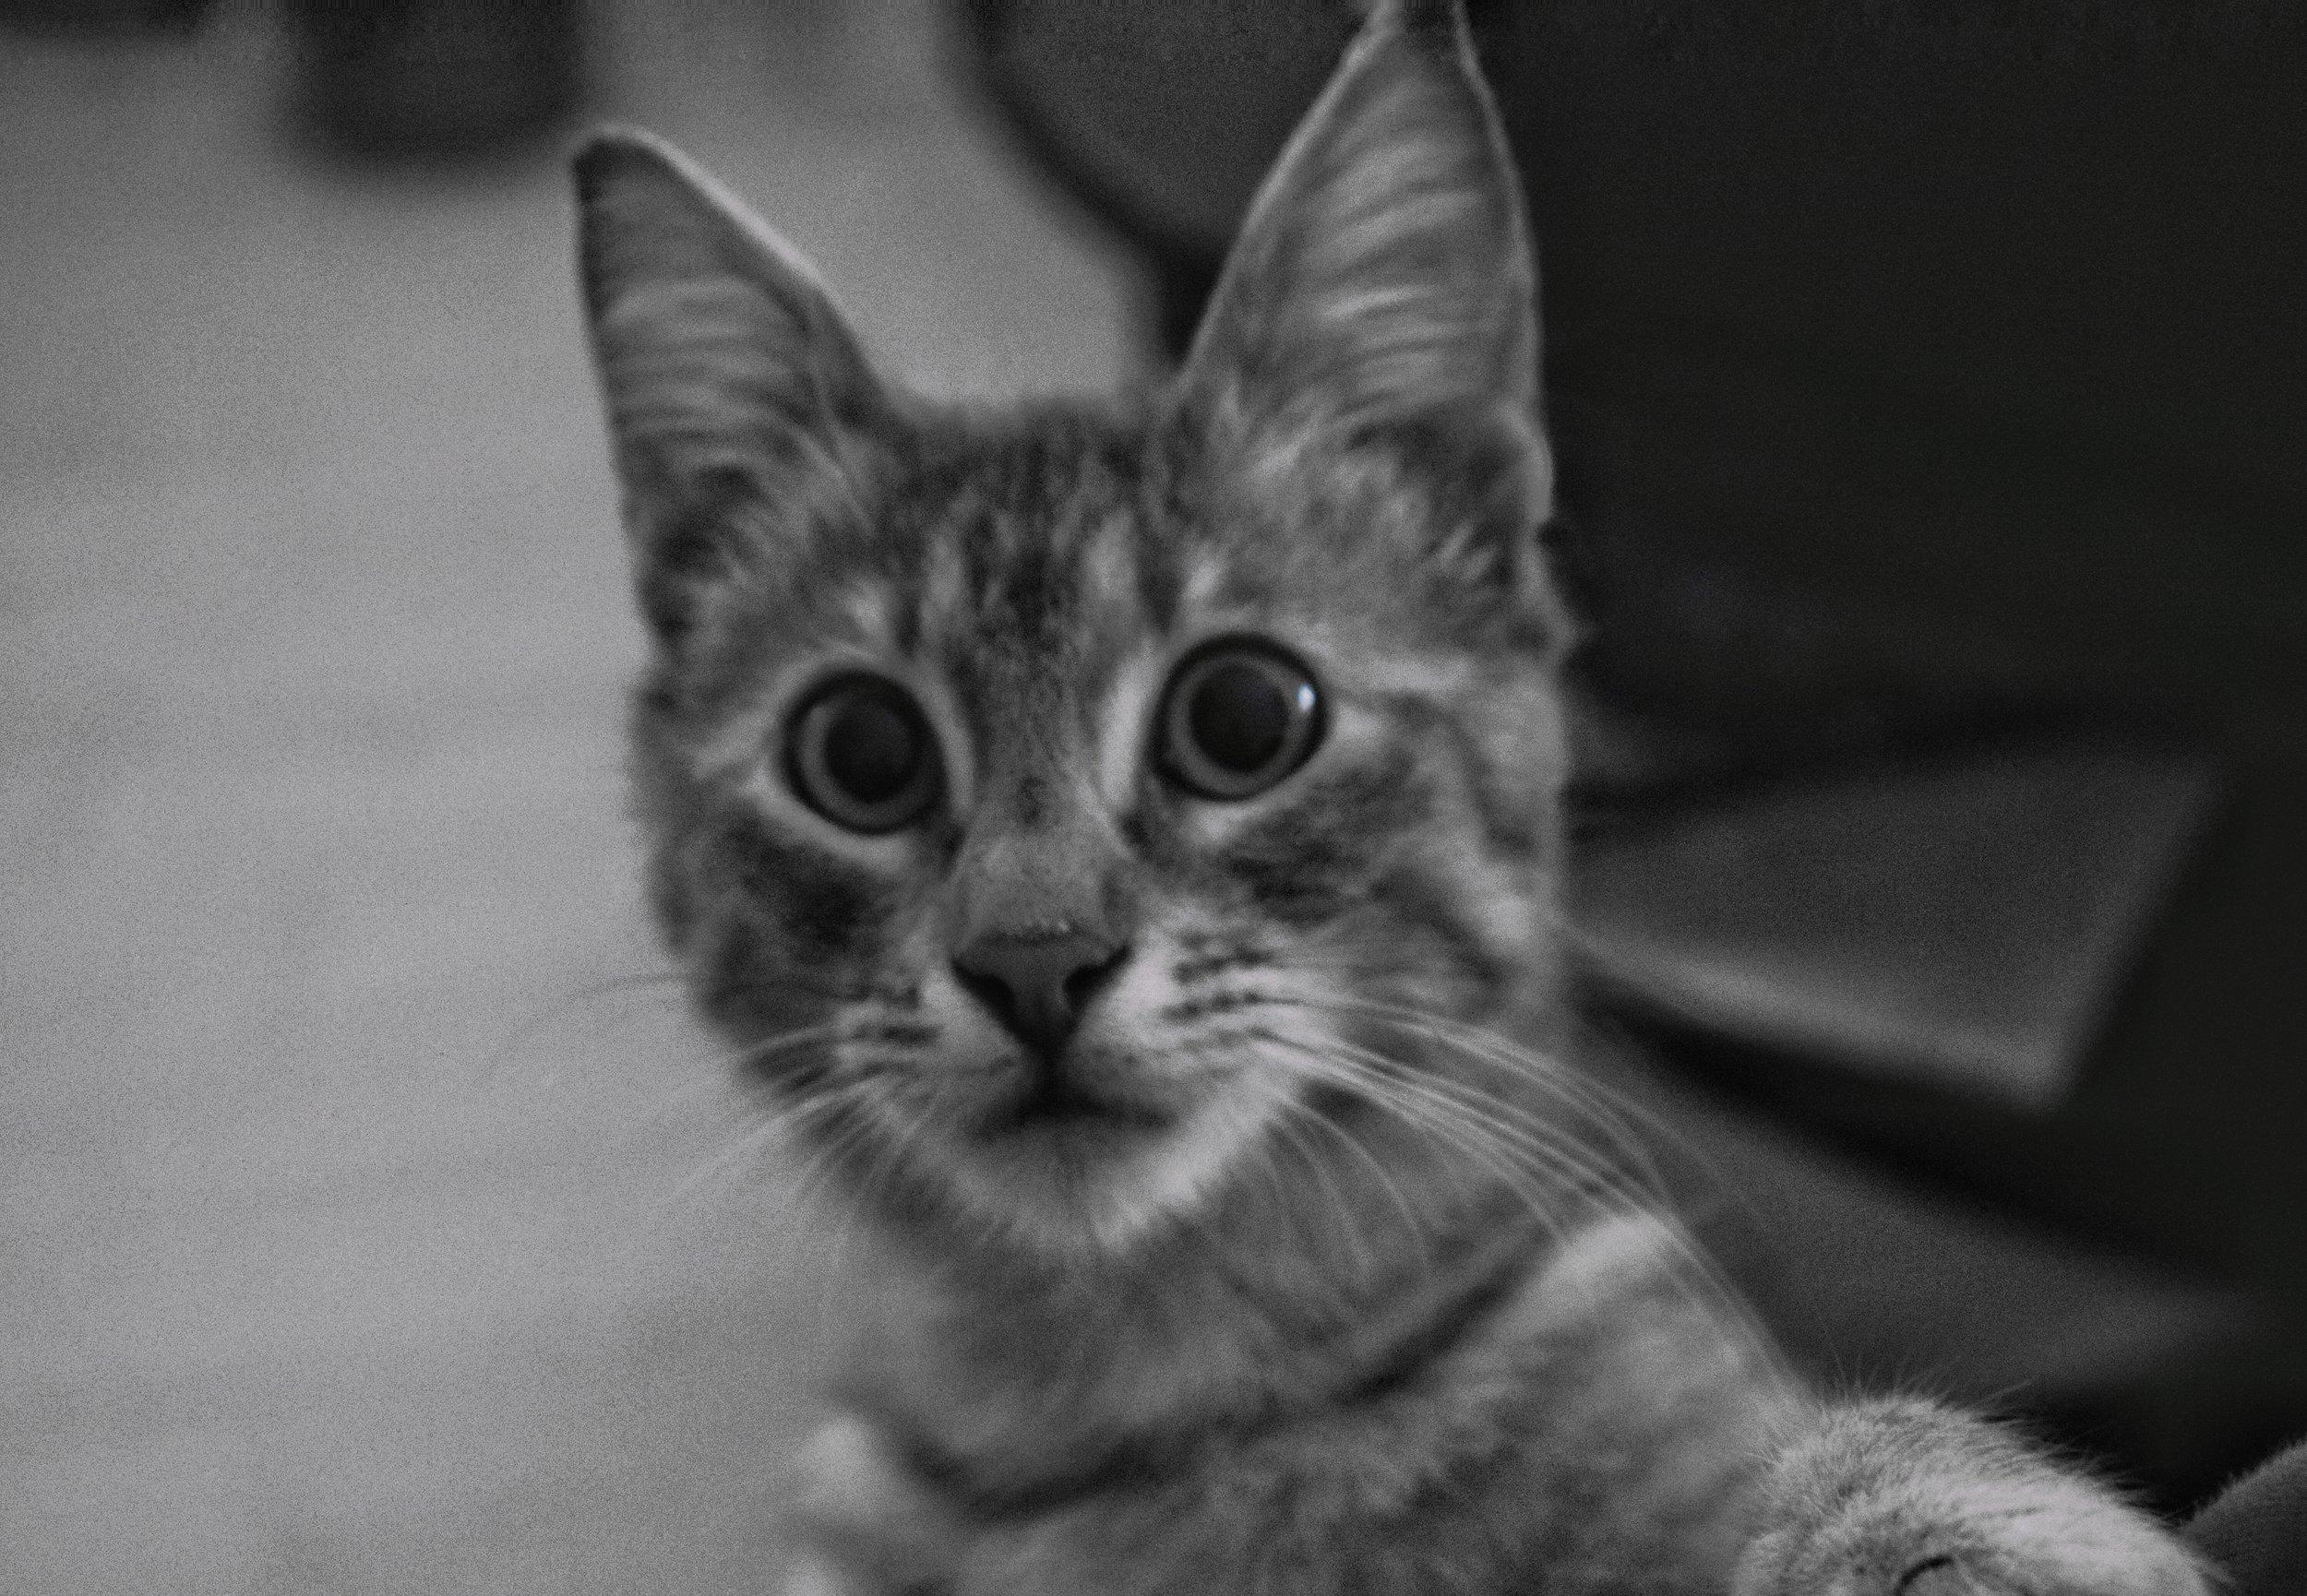 Meet the cuddly, fuzzy co-founder of WeedCopywriter.com